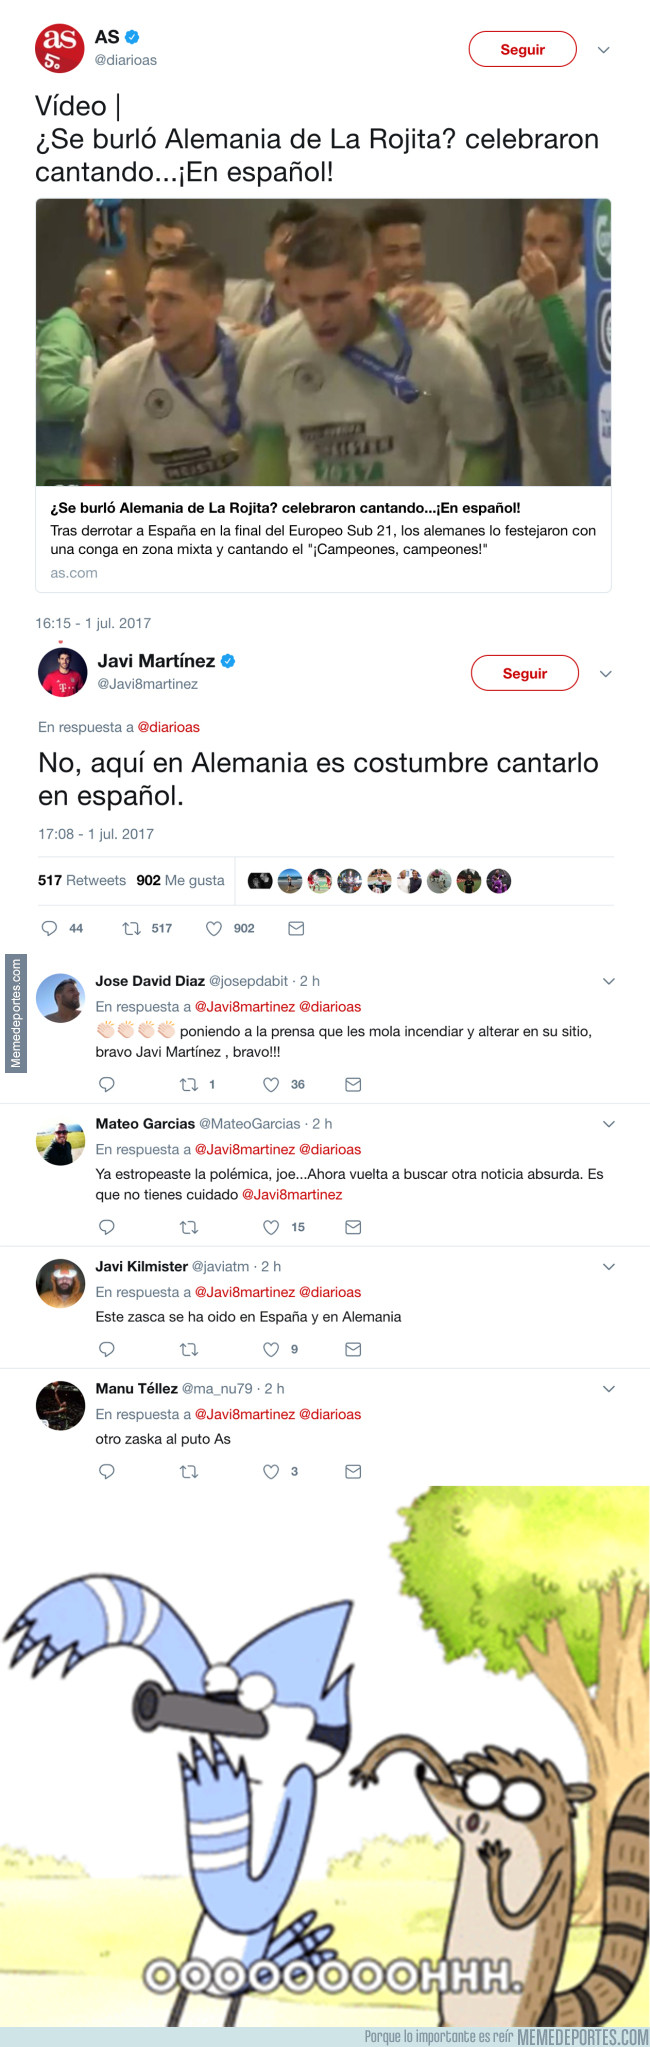 985084 - ZASCA tremendo de Javi Martínez al diario AS tras su periodismo basura